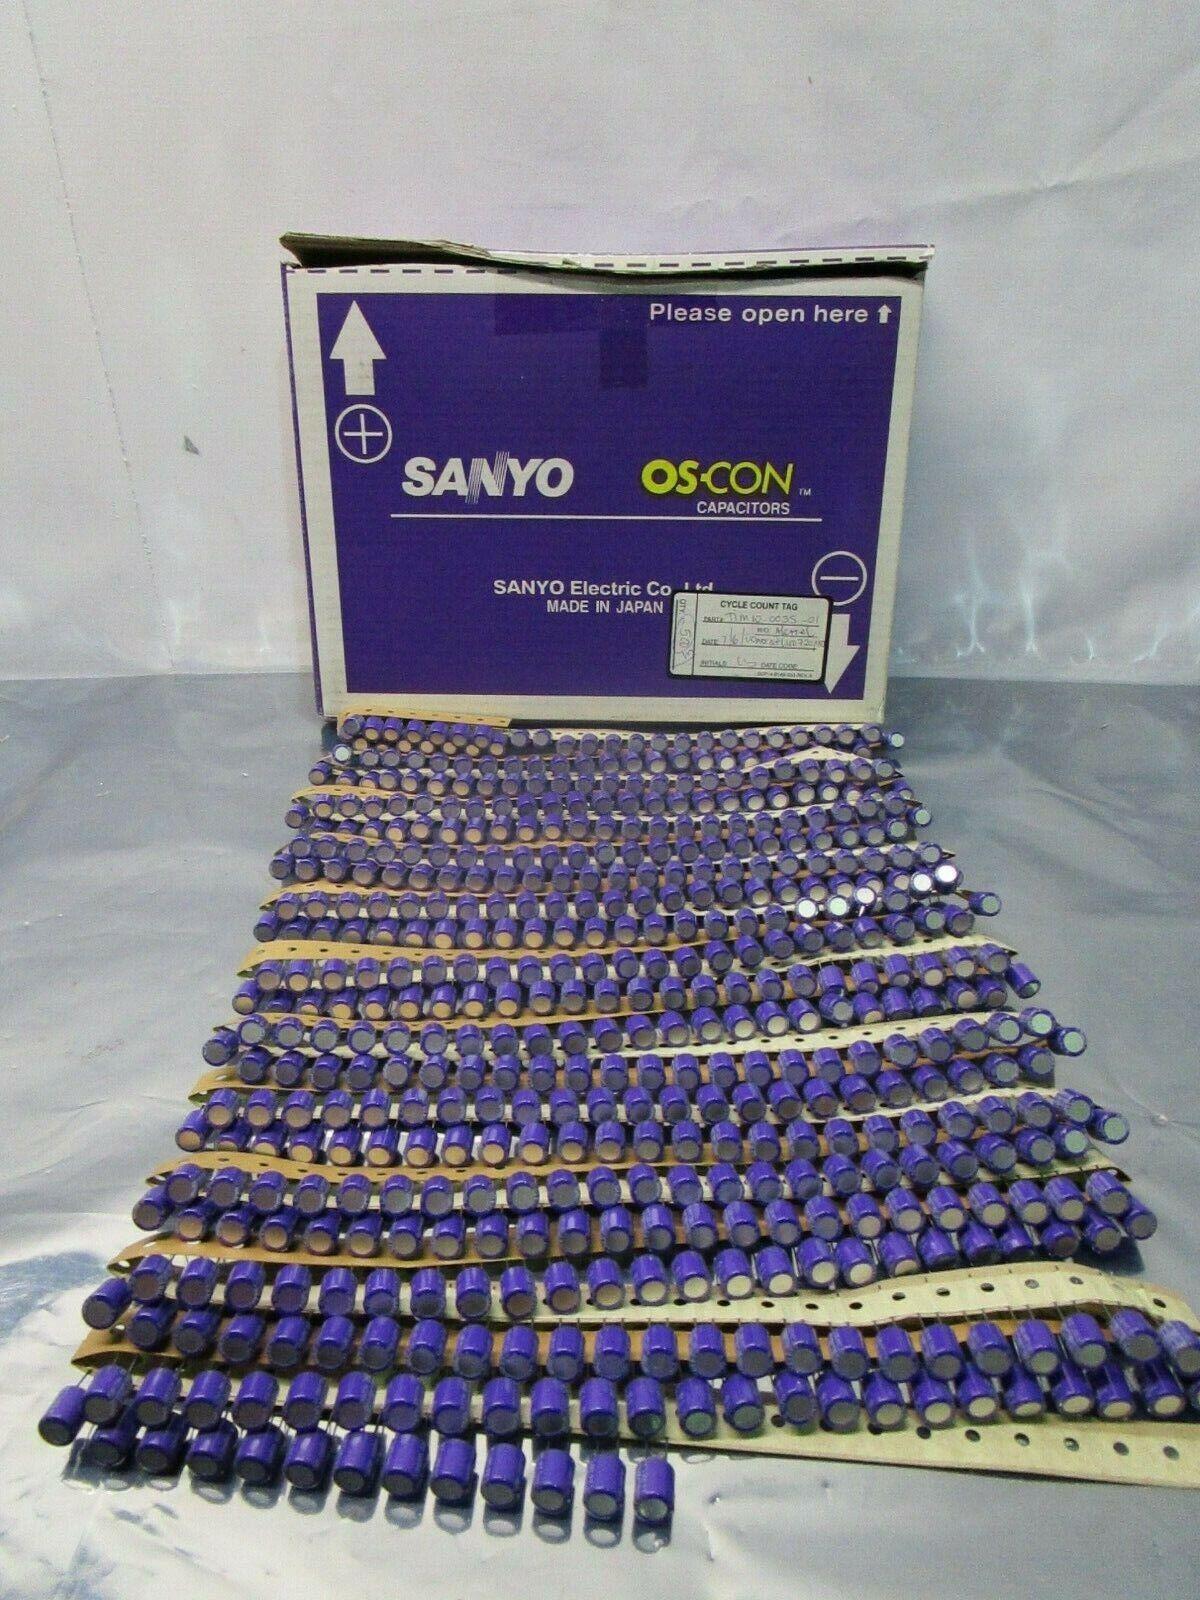 1 Lot of 500 Sanyo 270uF OS-CON Capacitor, 16V, 102376